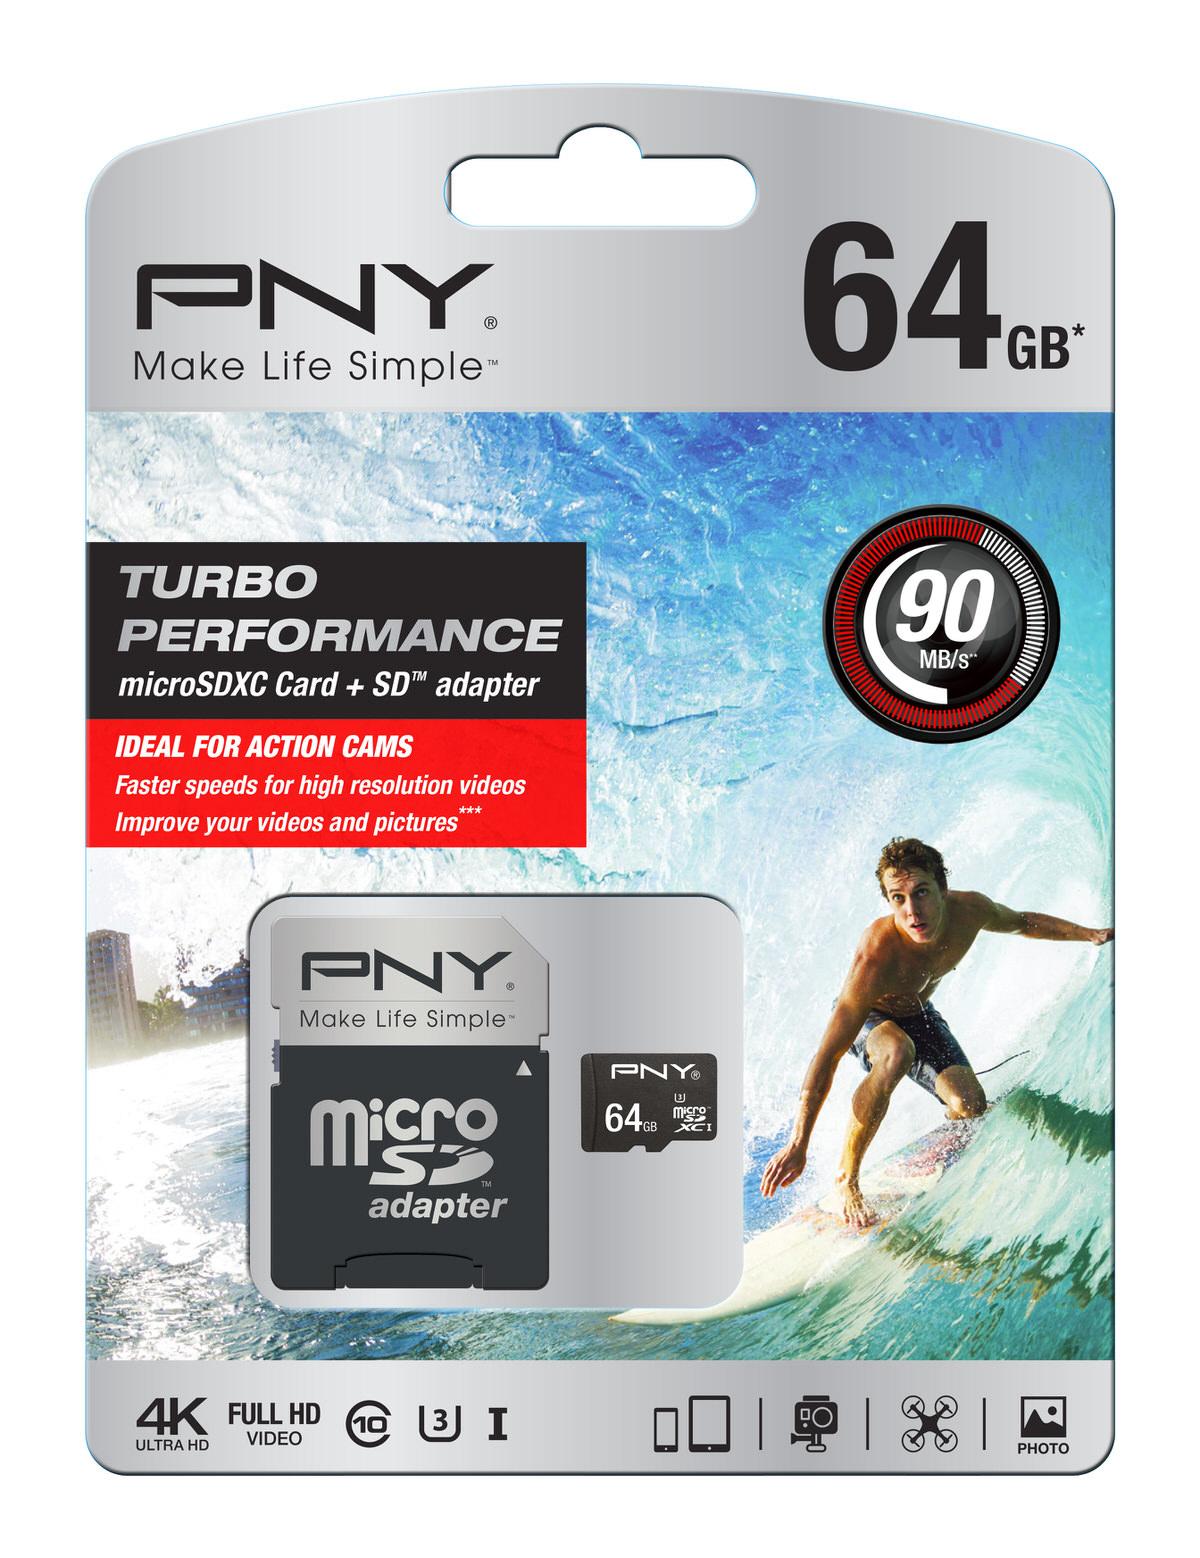 PNY_Microsd_TurboPerformance_pack